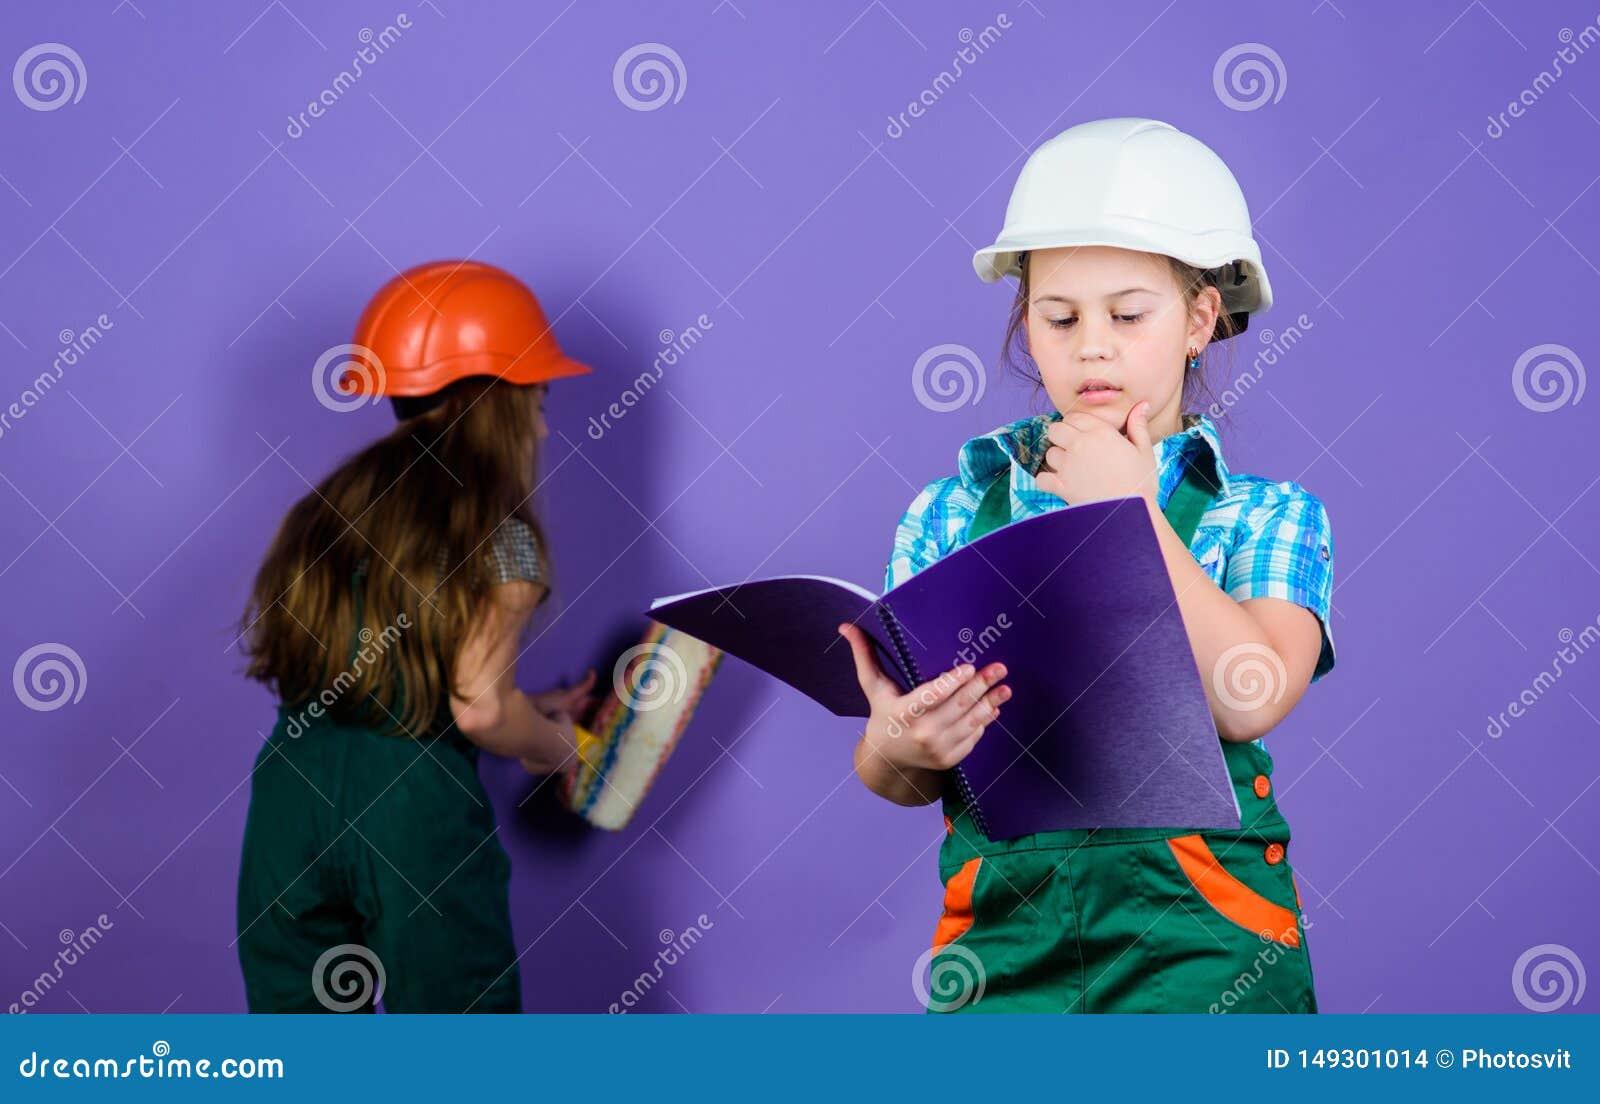 De architect van de bouwersingenieur Jong geitjearbeider in bouwvakker Kinderverzorgingontwikkeling kleine meisjes die samen in w